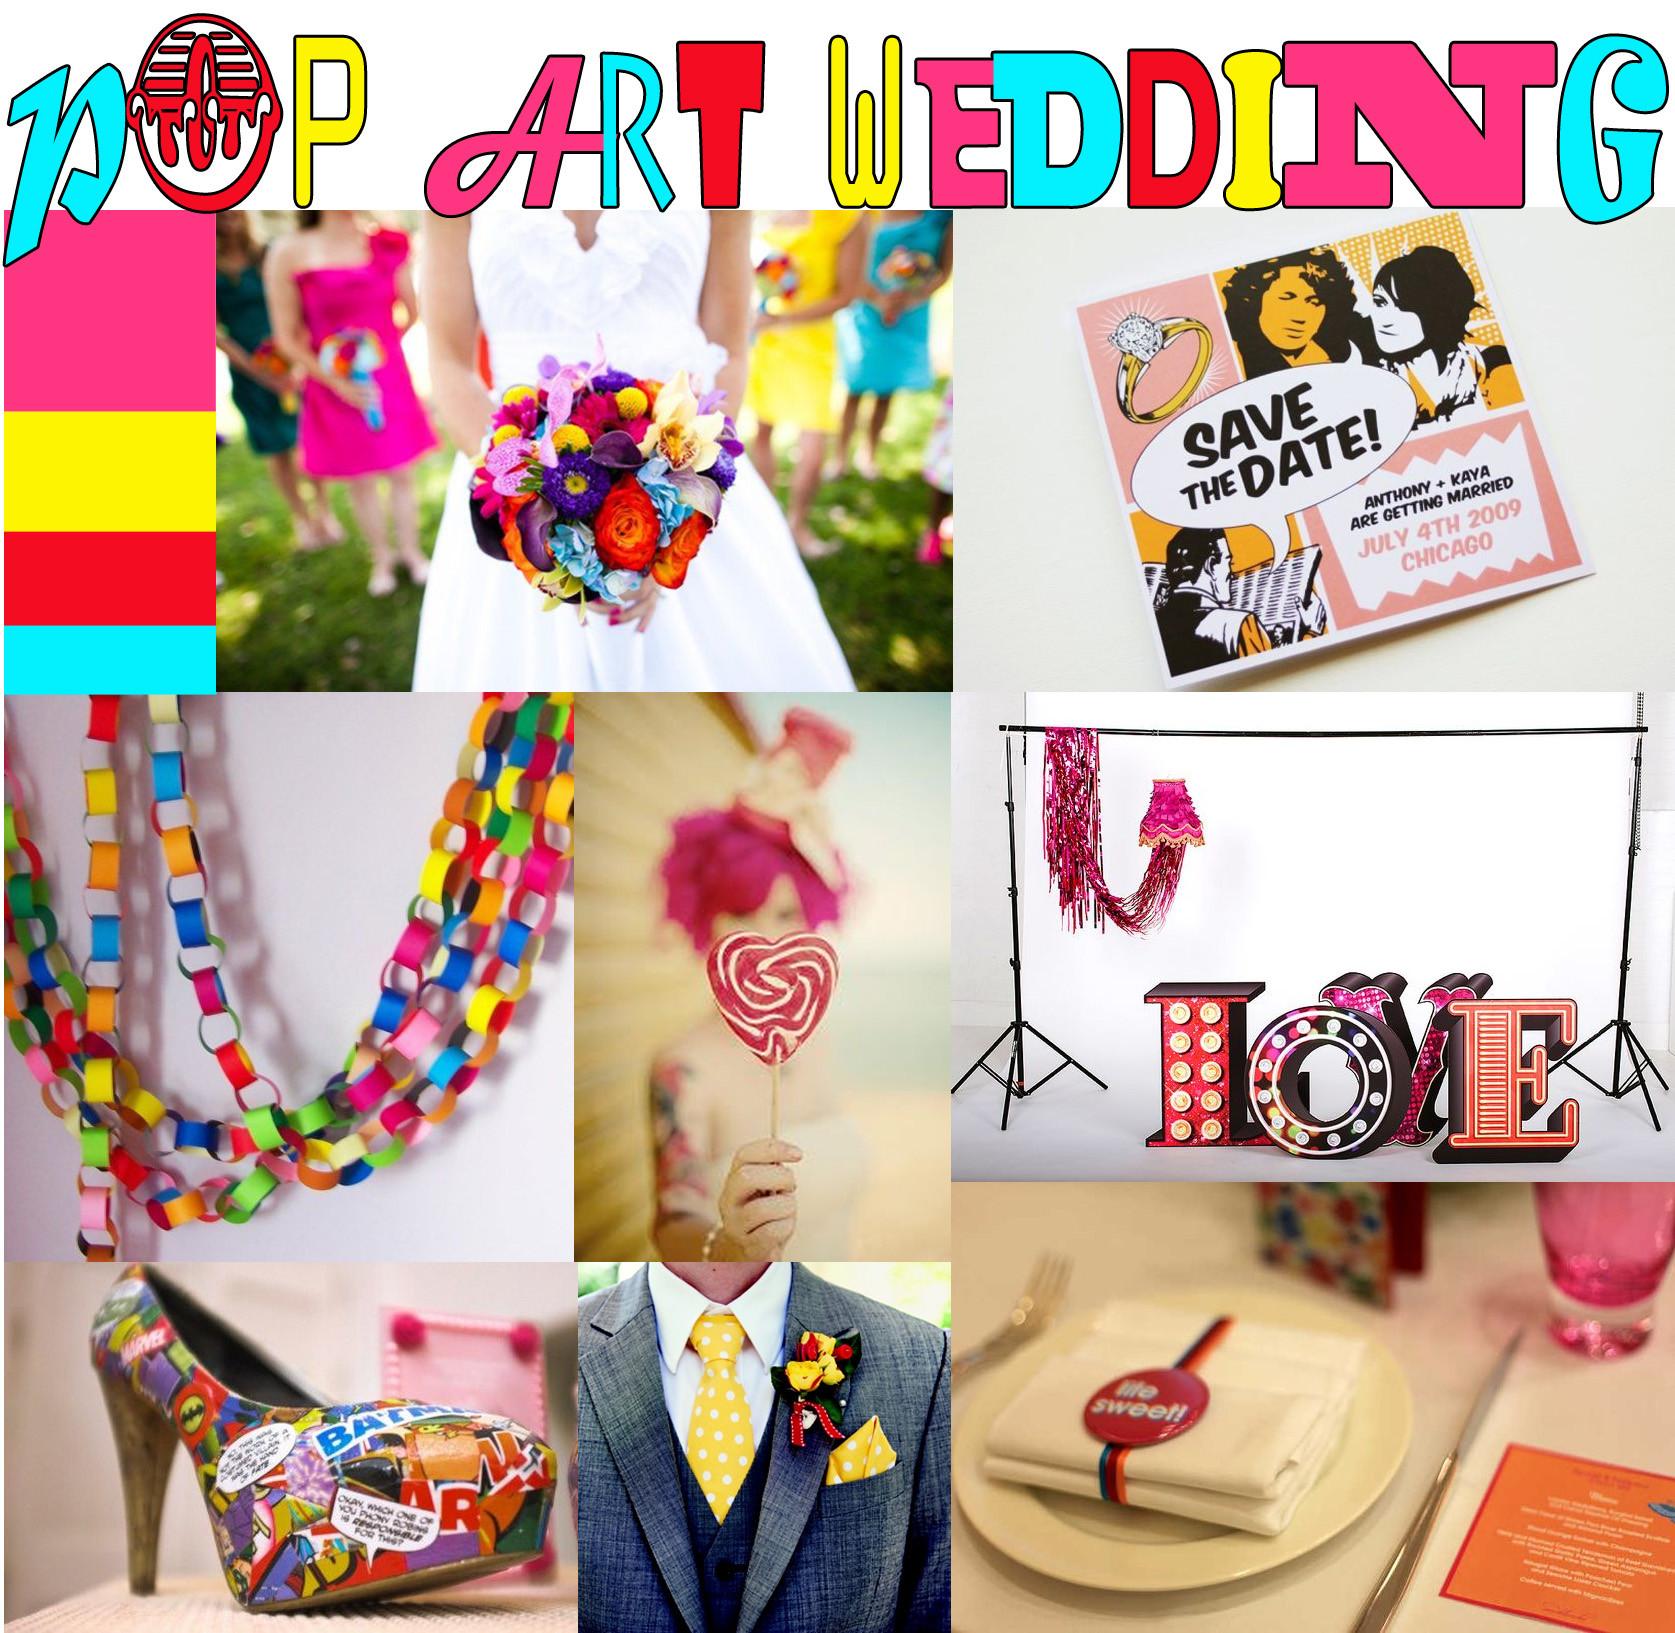 Abstract Weddings